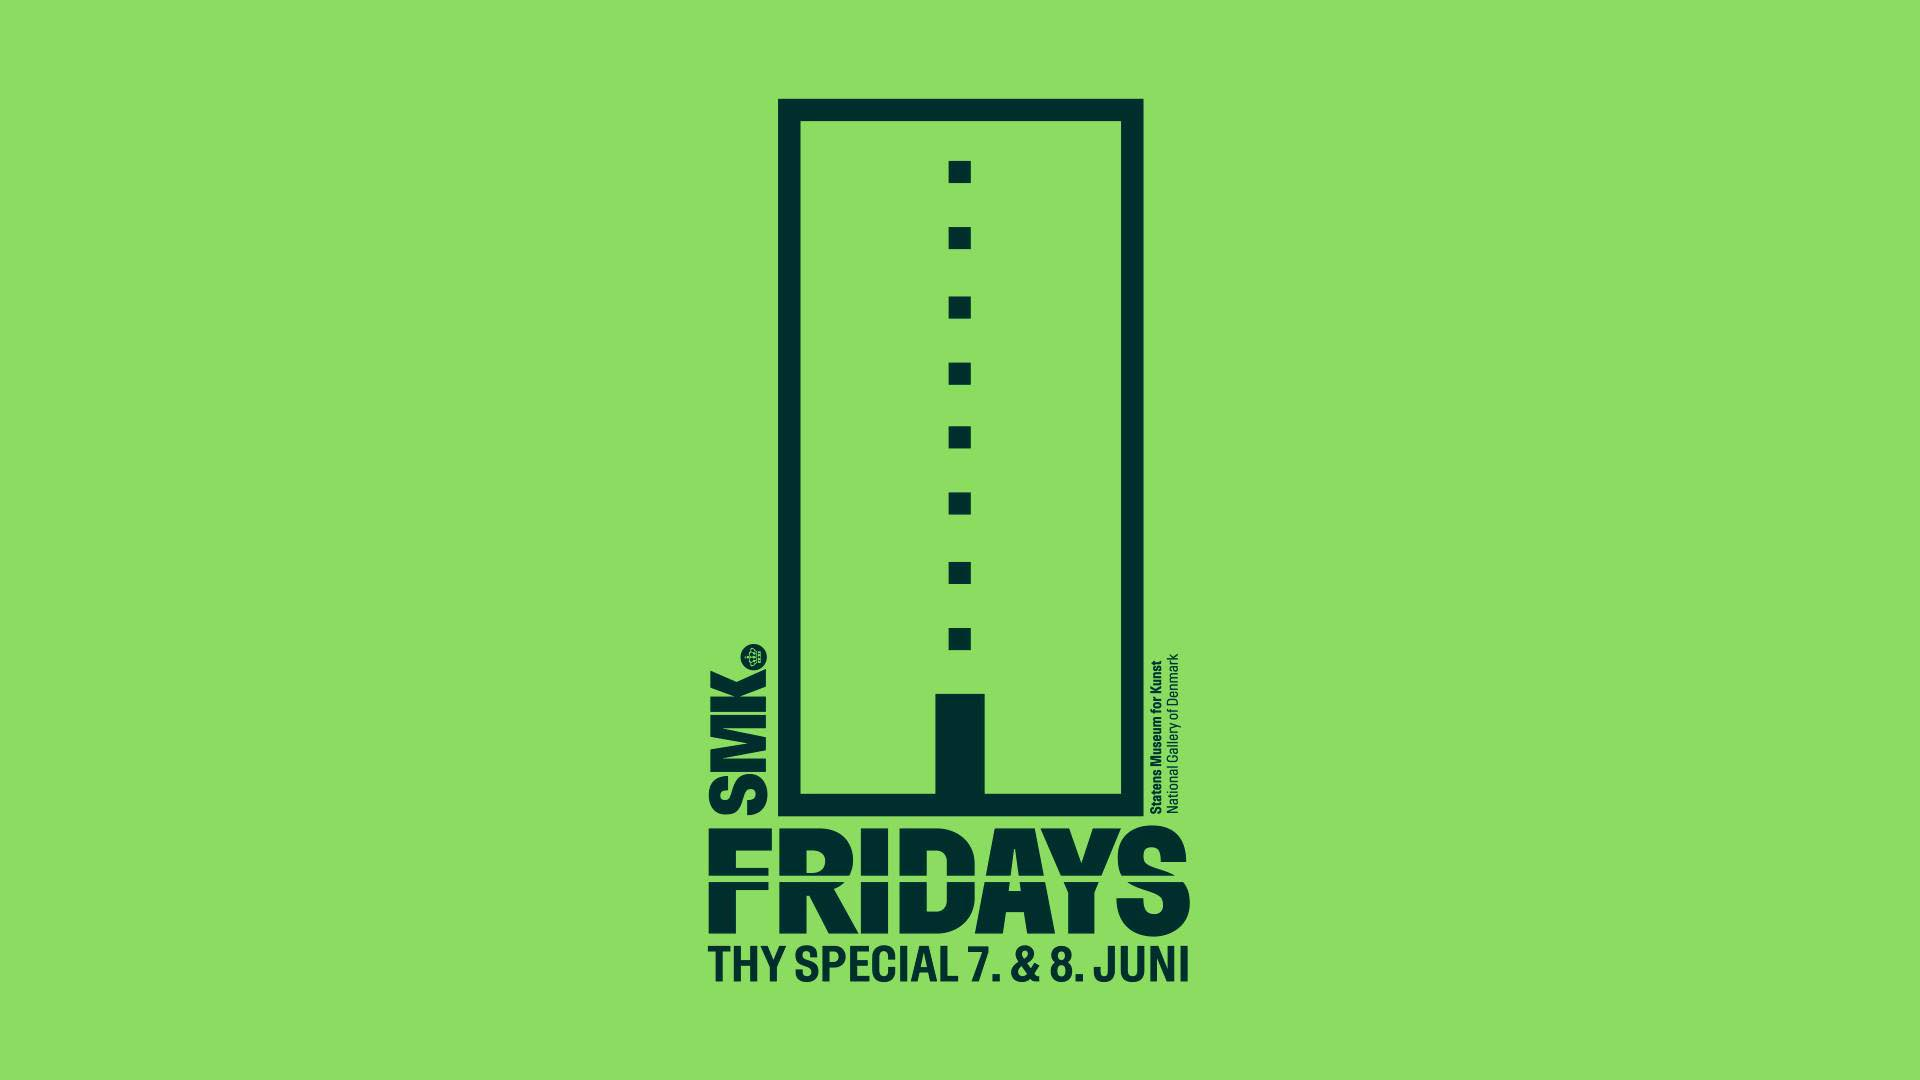 SMK Friday top.jpg